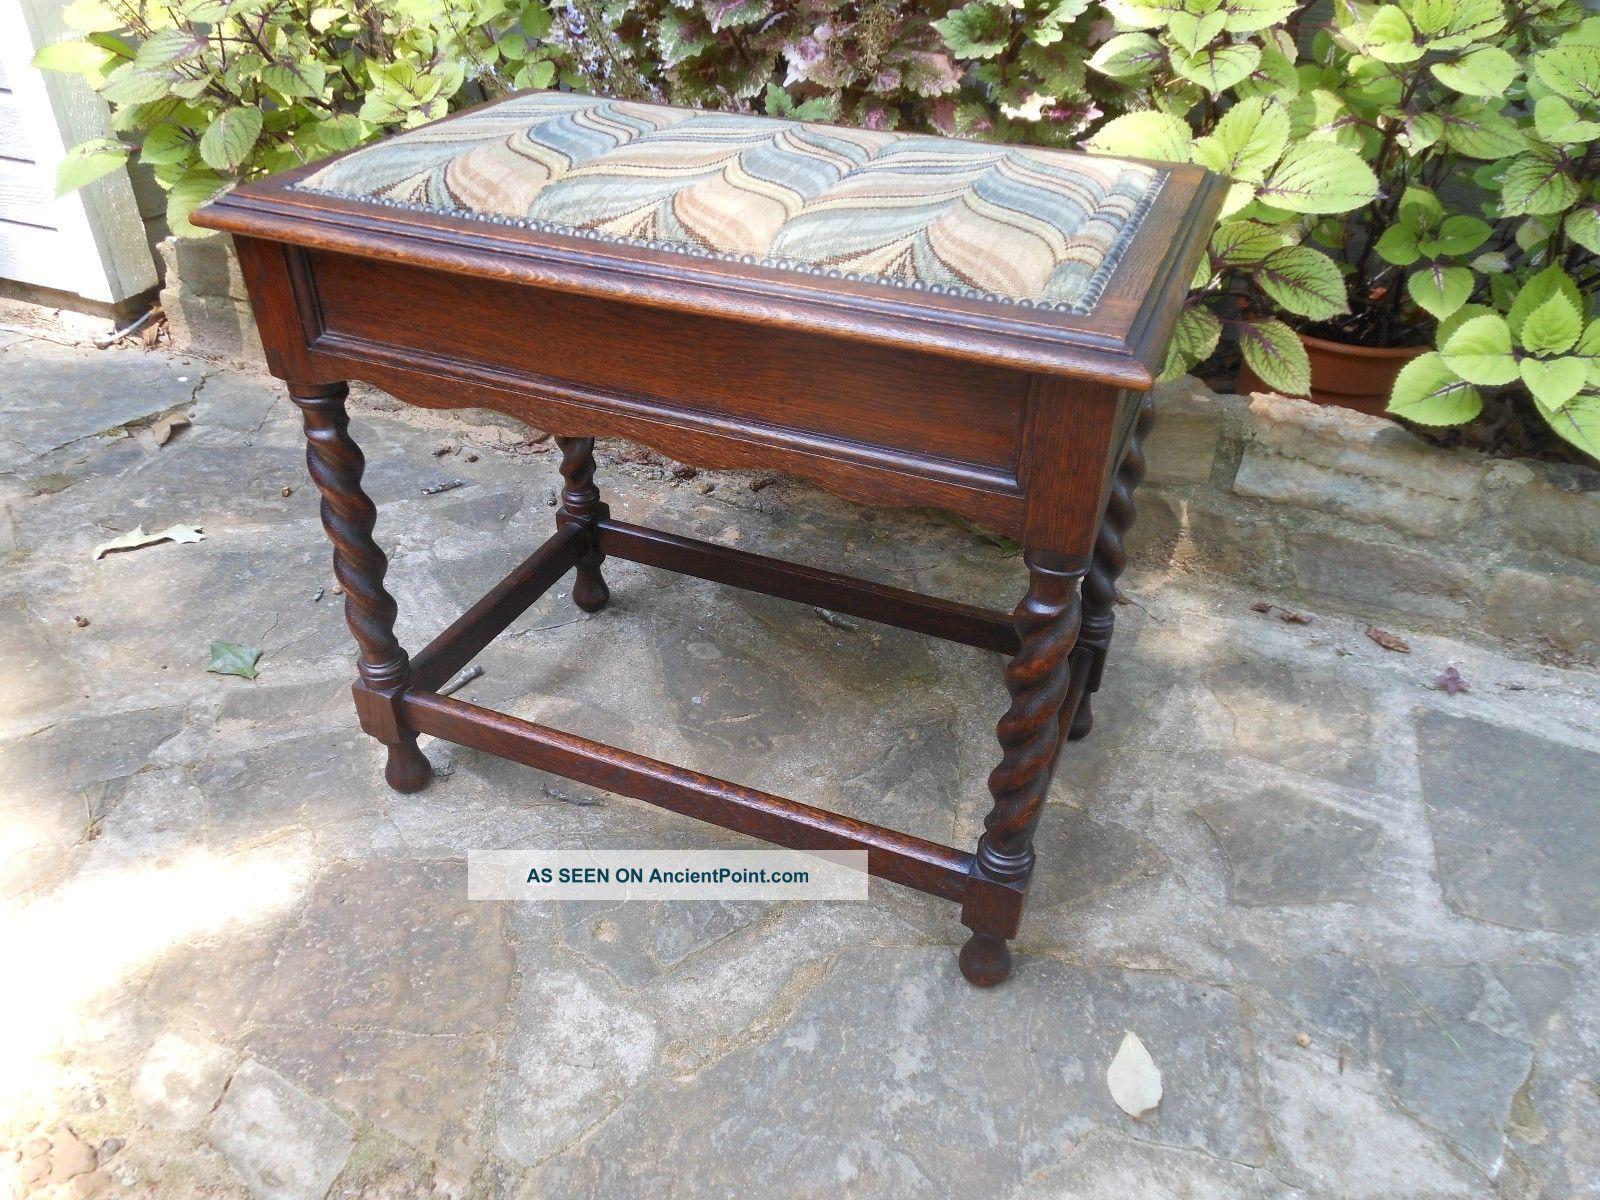 Oak Barley Twist Piano Organ Vanity Bench Stool Seat From England 1900-1950 photo